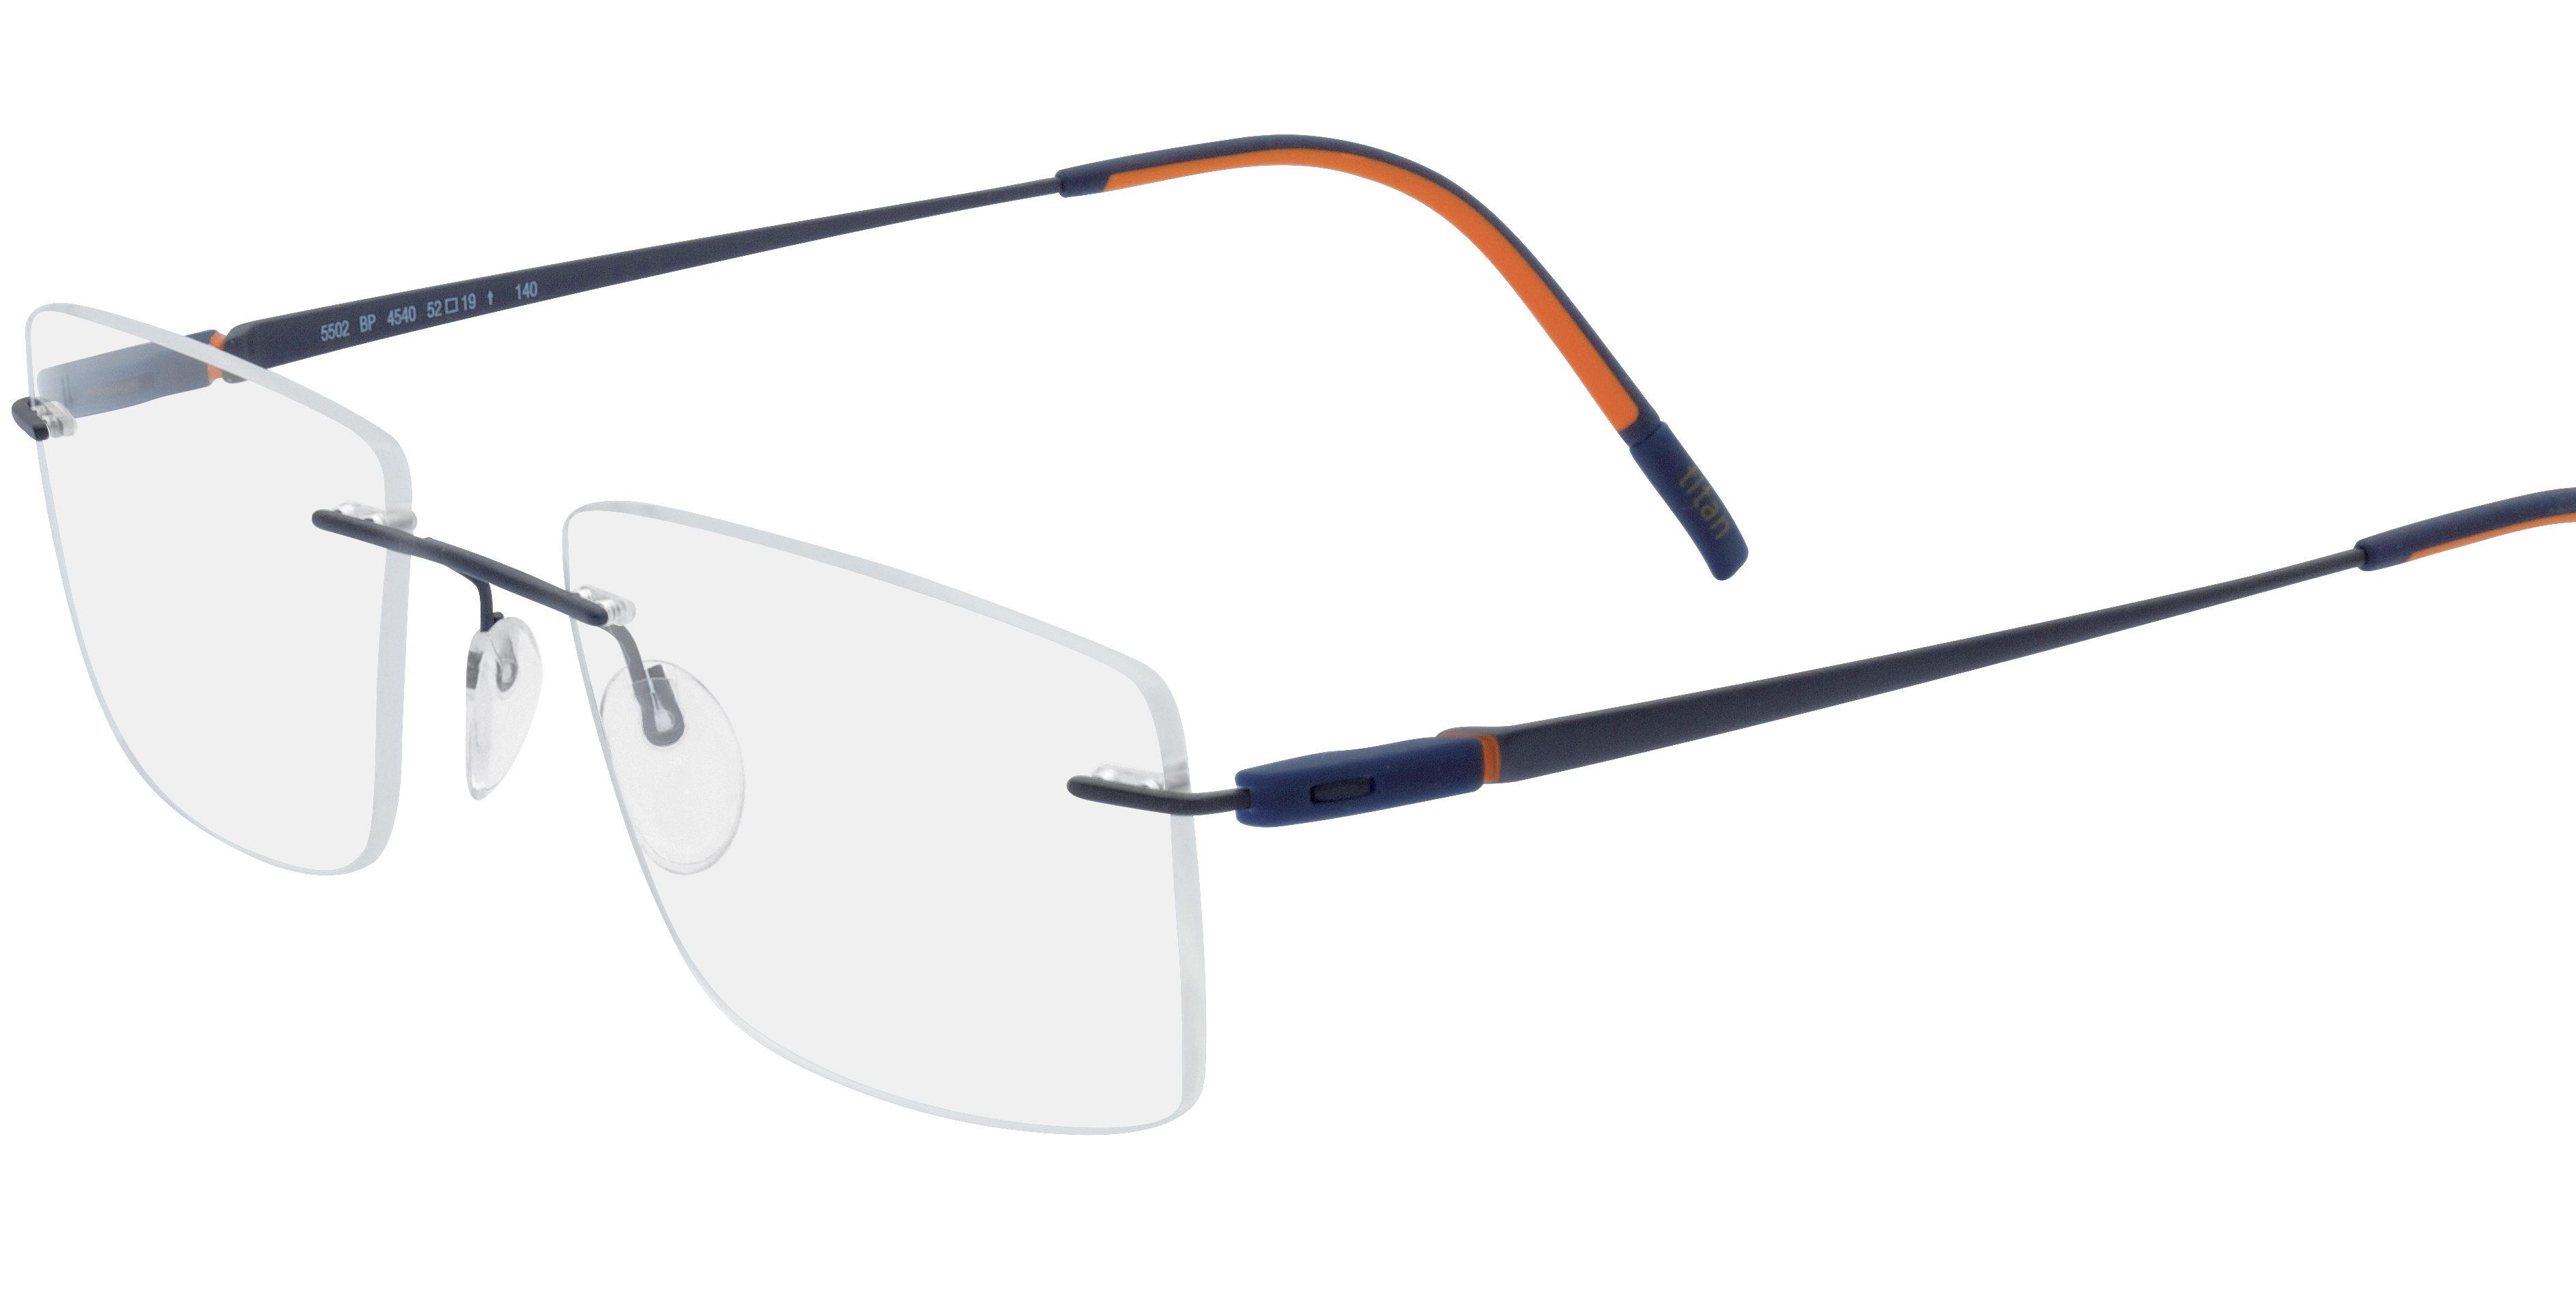 Silhouette 5502 Bp Eyecare Plus Corrimal